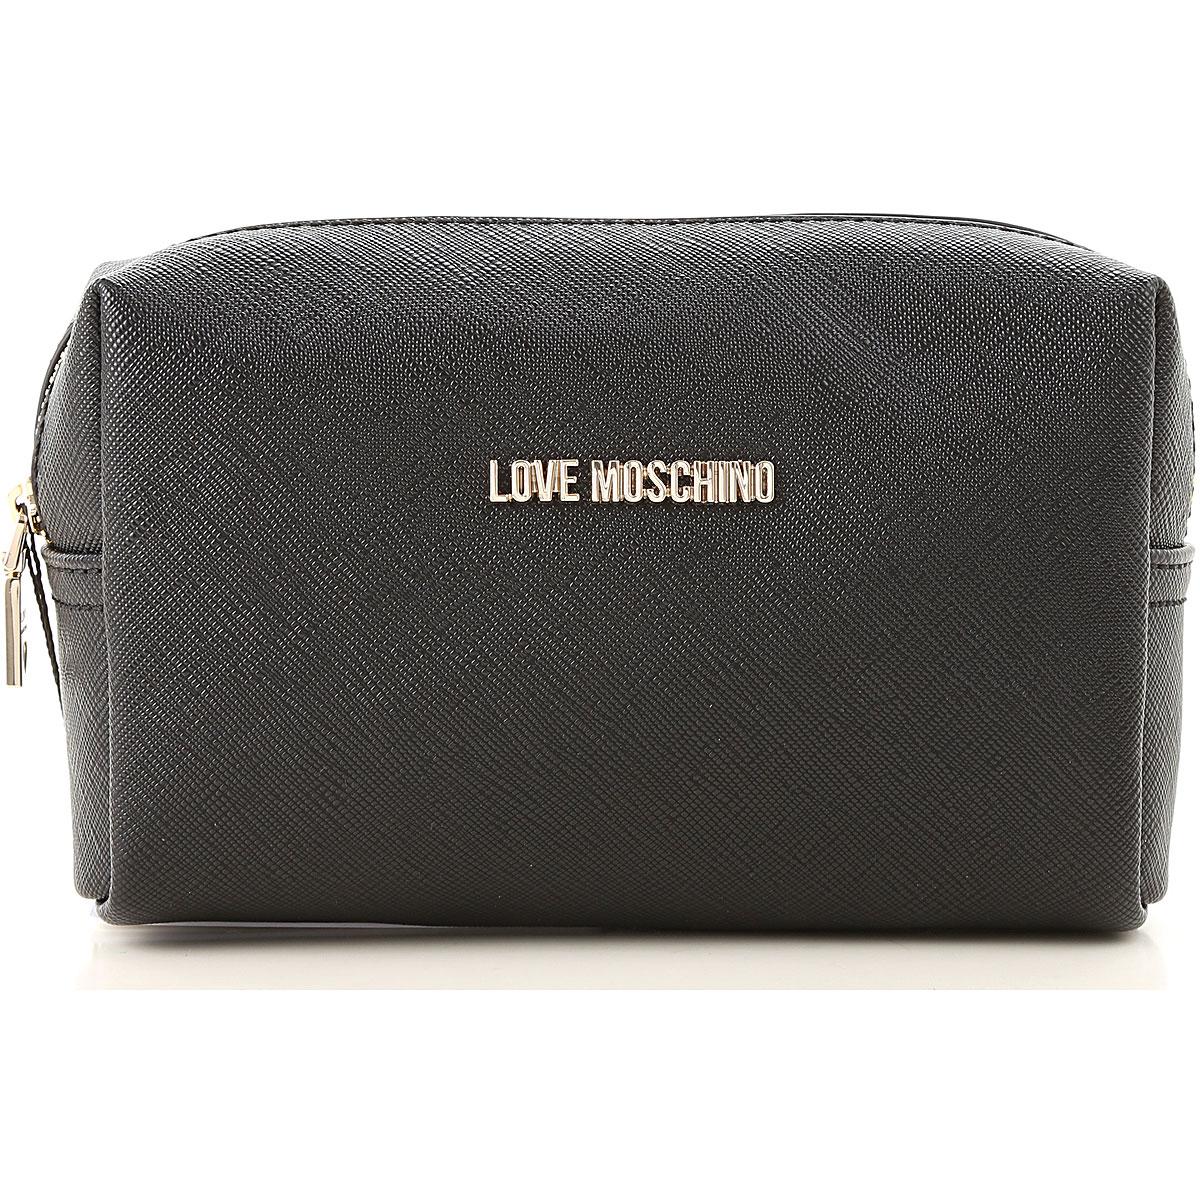 Image of Moschino Toiletry Bags, Black, polyurethane, 2017